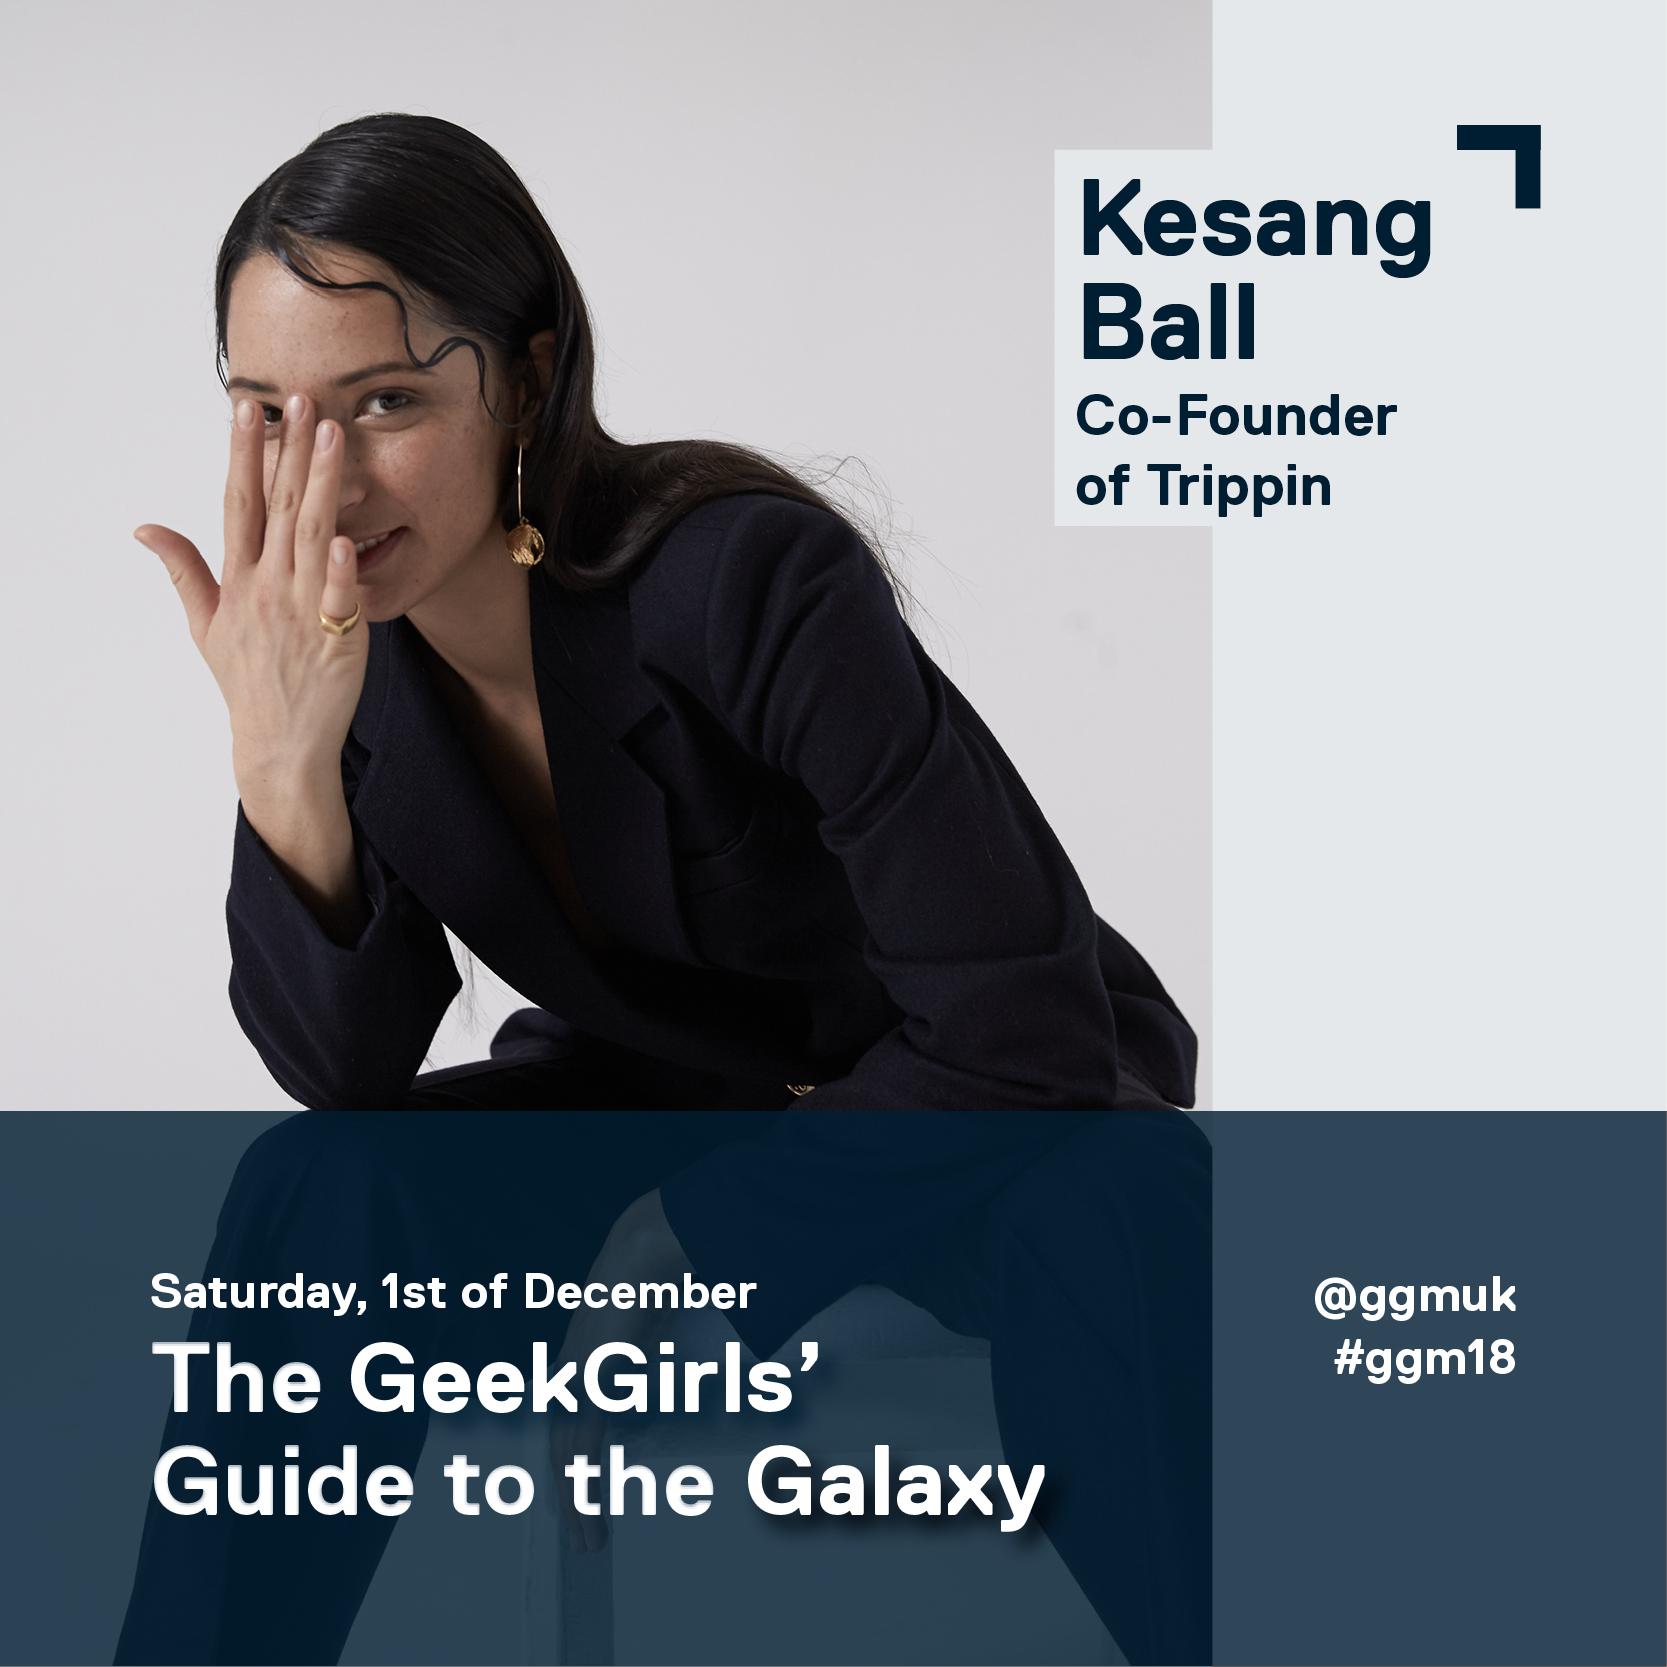 TwitterCard_Kesang Ball.jpg